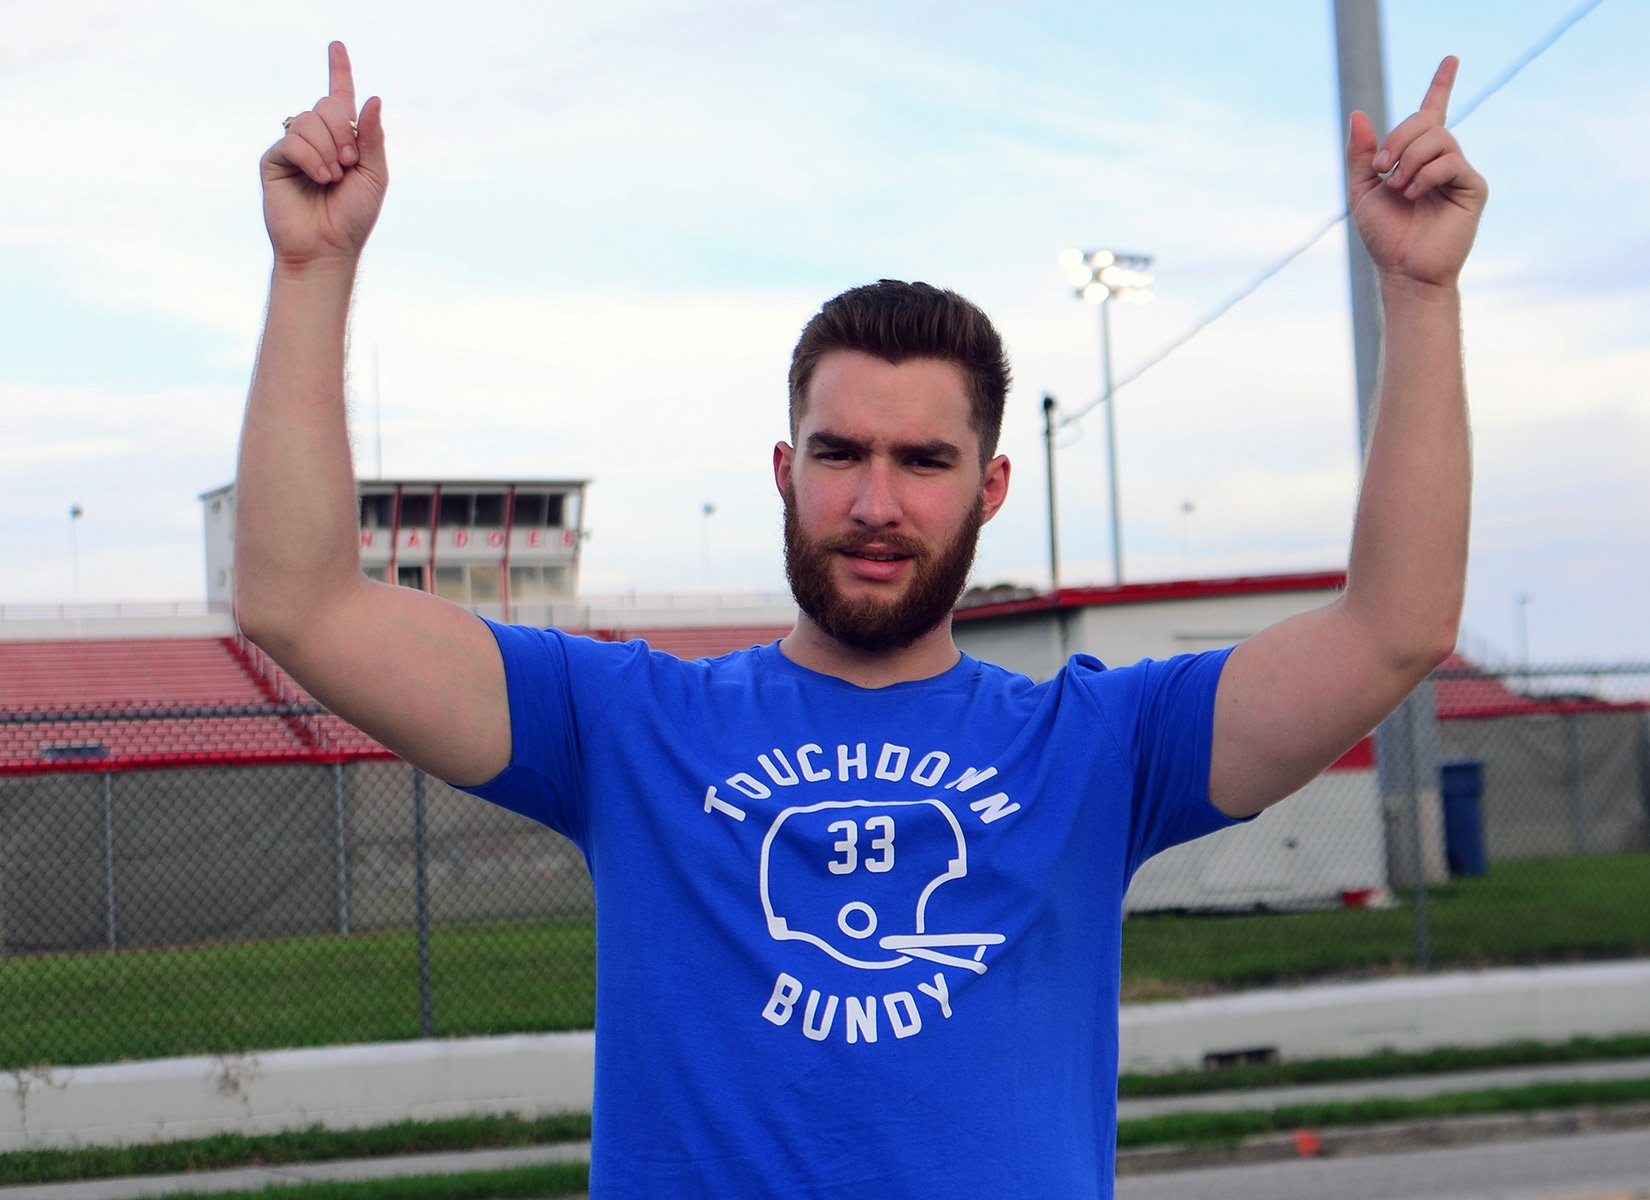 Touchdown Bundy on Mens T-Shirt